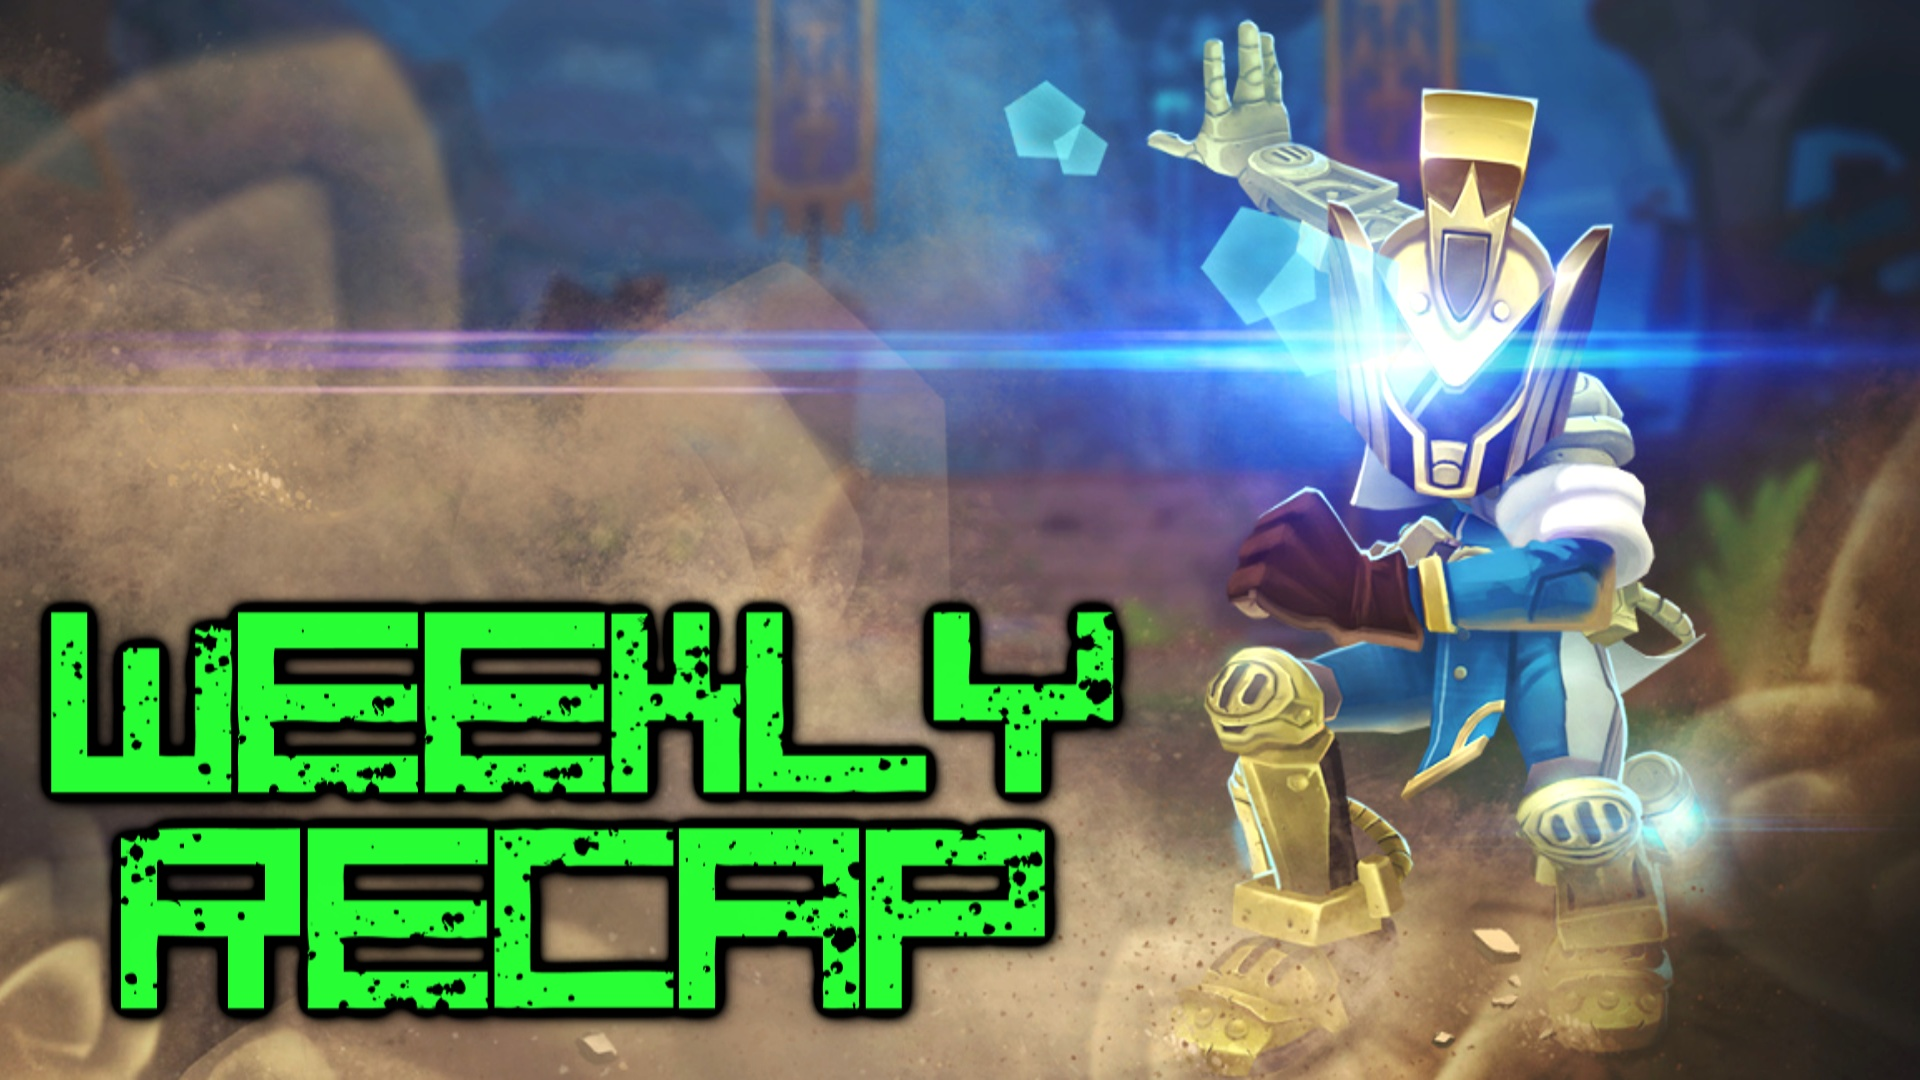 MMOHuts Weekly Recap #256 Sept. 7th - Dungeon Defenders II, Mortal Online, Smite & More!